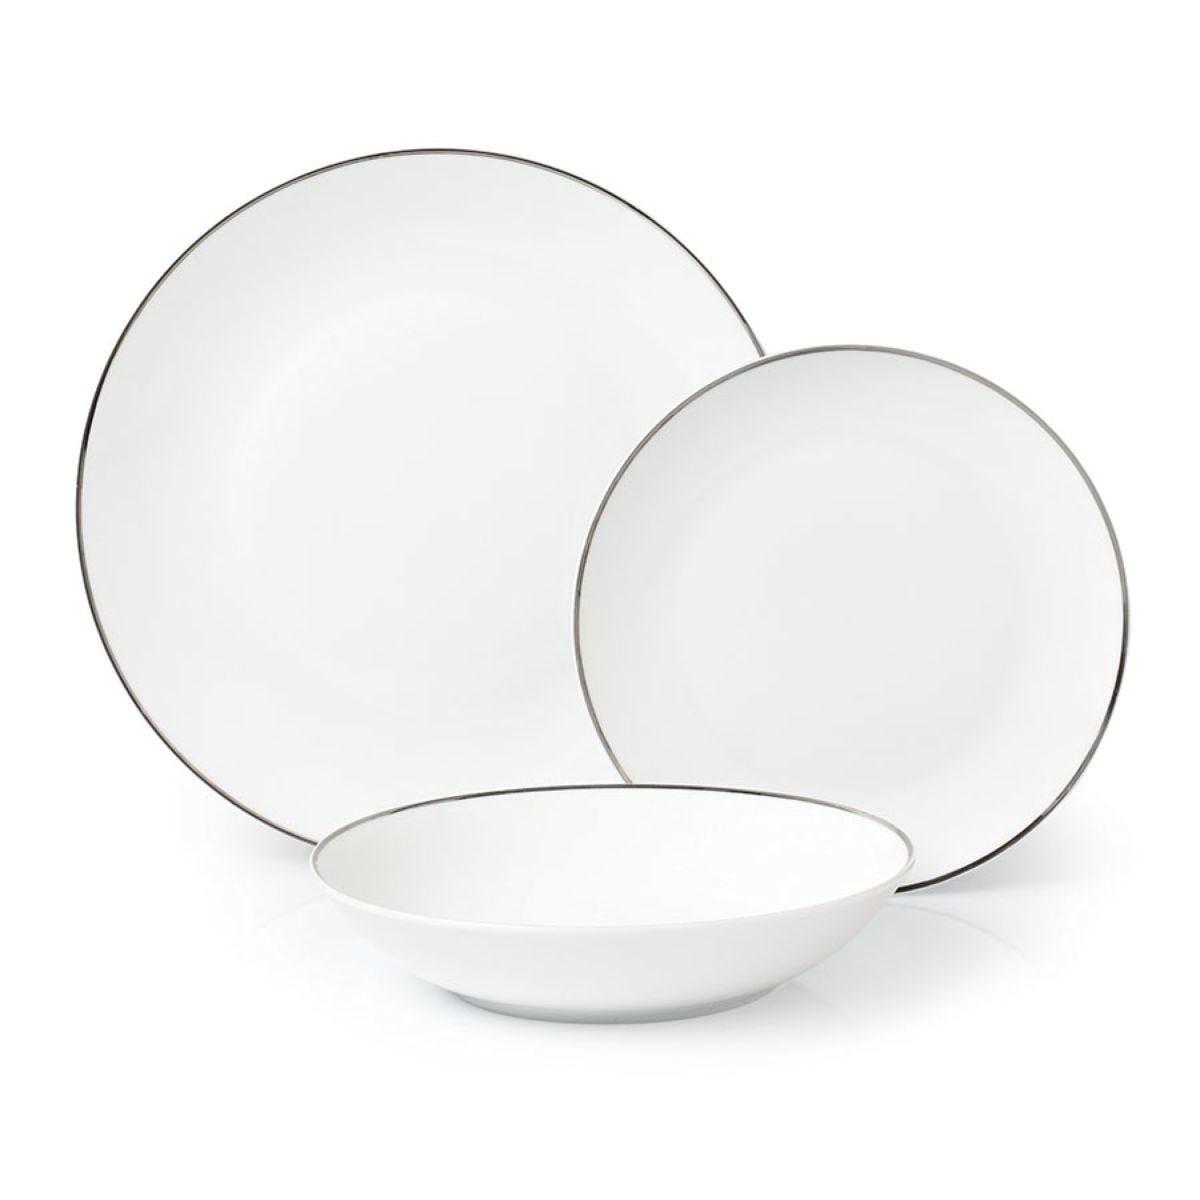 Robert Dyas 24-Piece Platinum Dinner Set - White